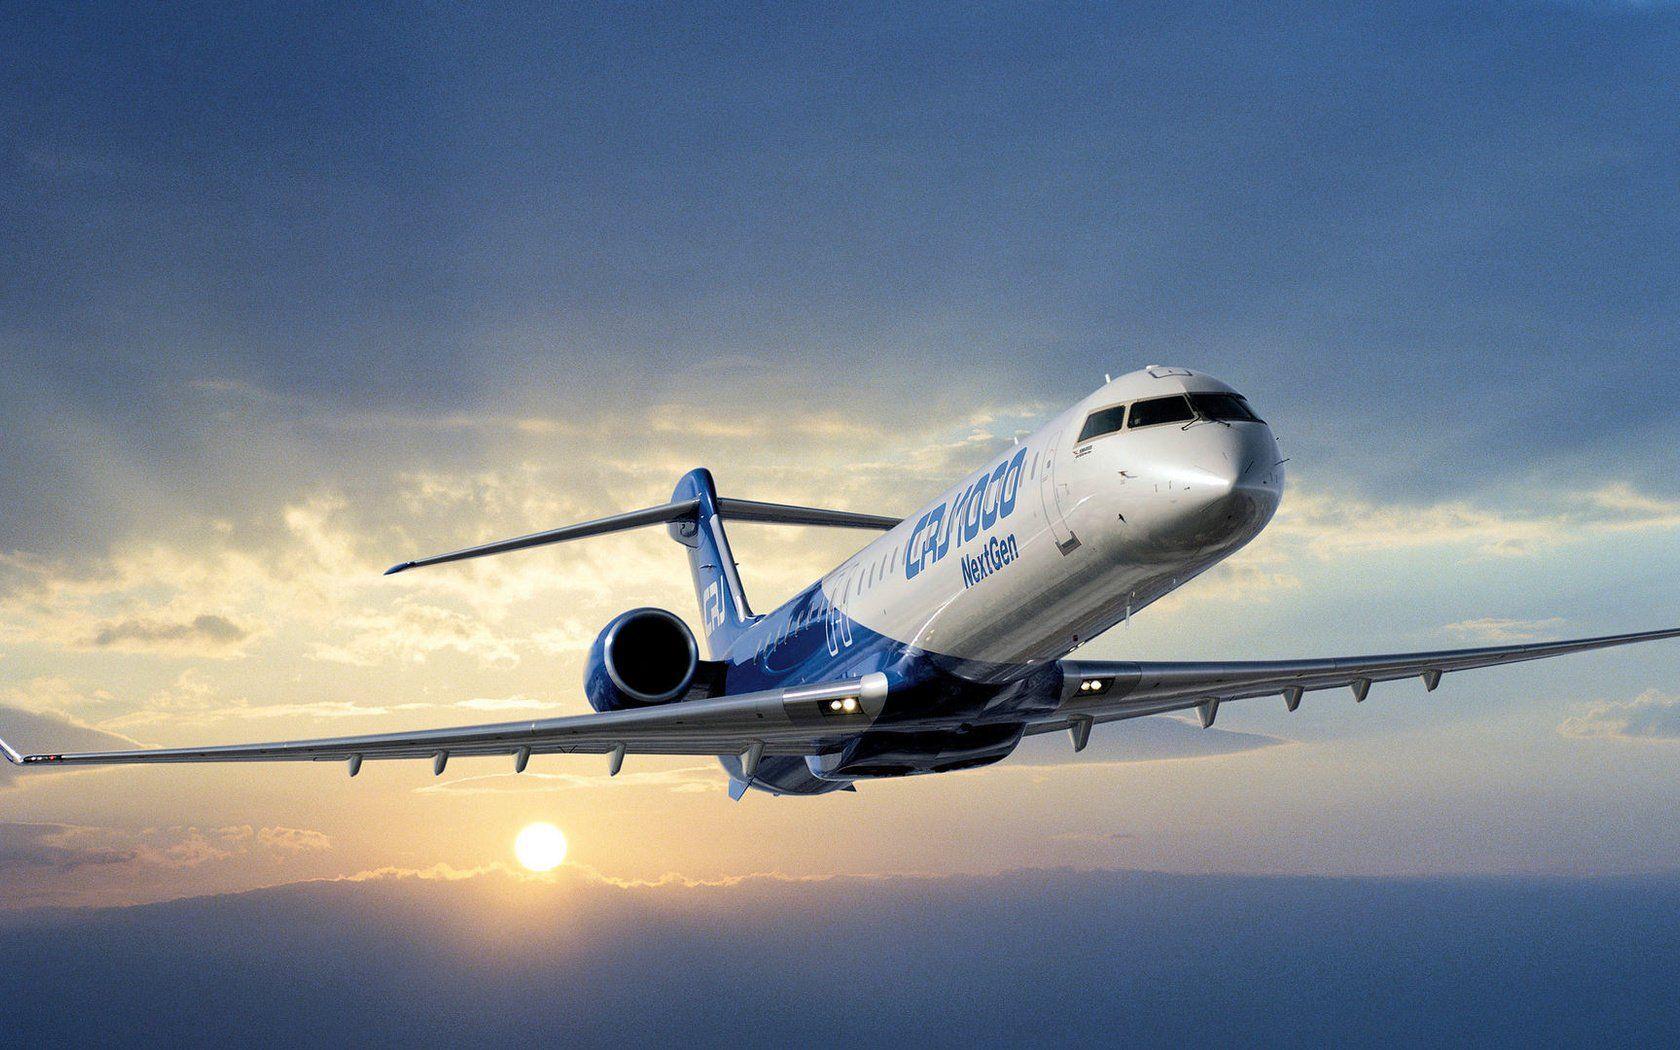 Aircraft Photo Passenger